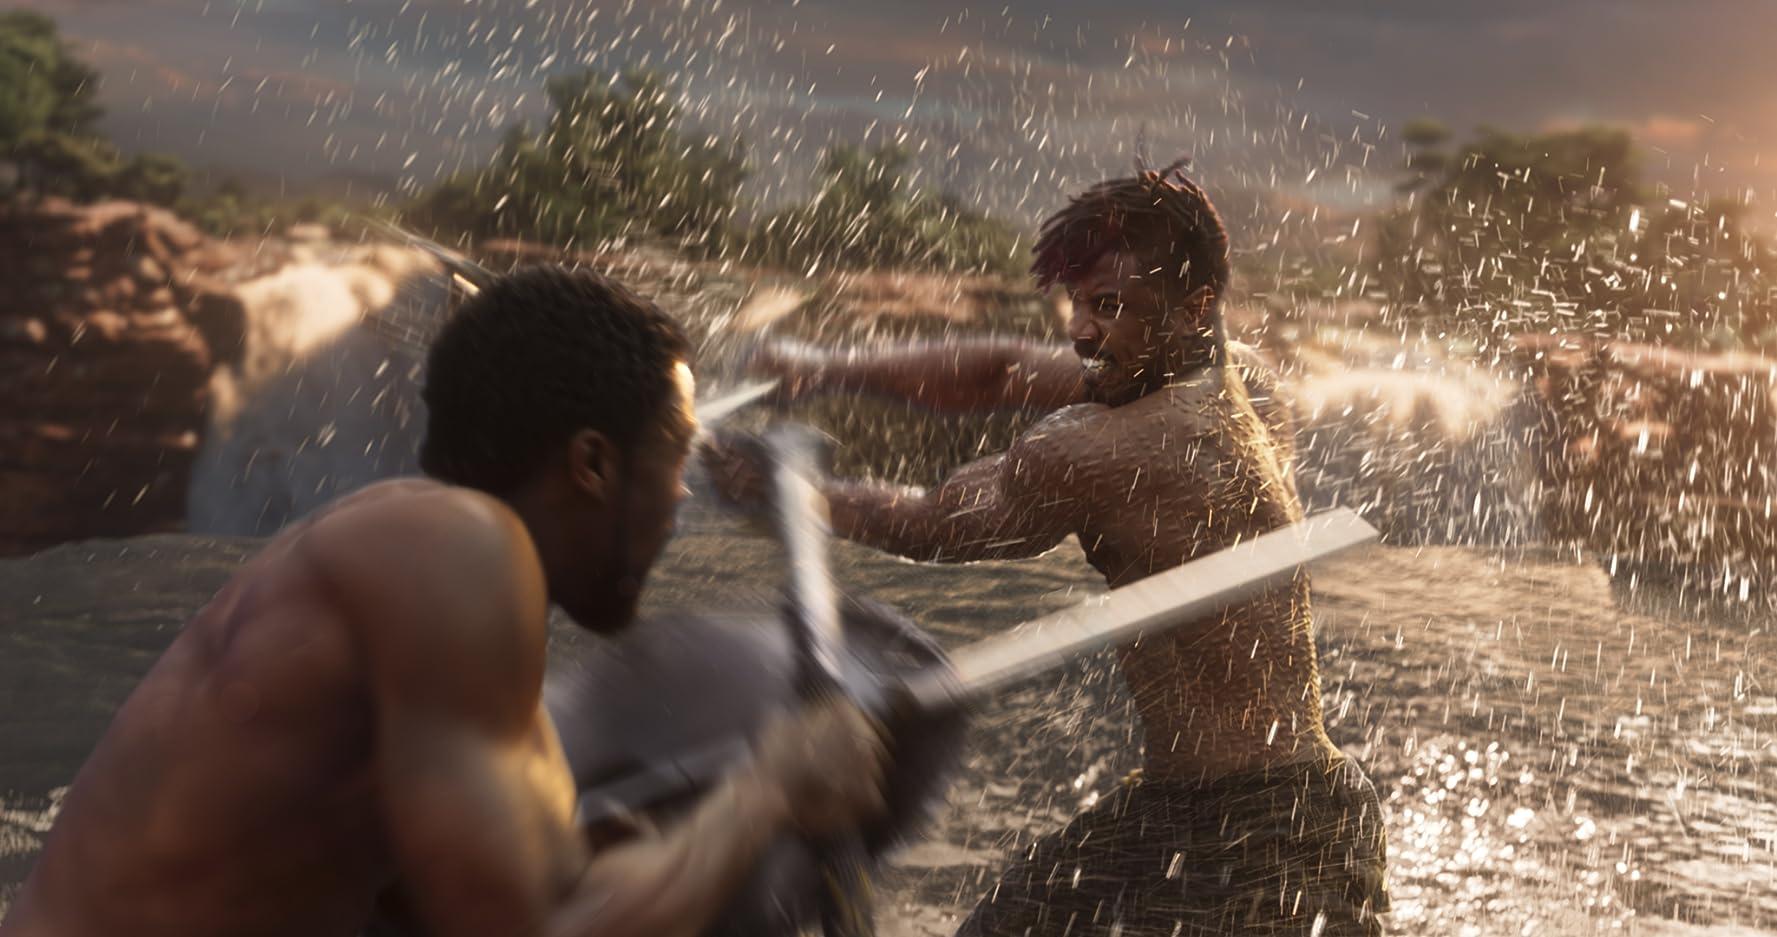 Killmonger kembali ke Wakanda untuk merebut tahta dari T'Challa.